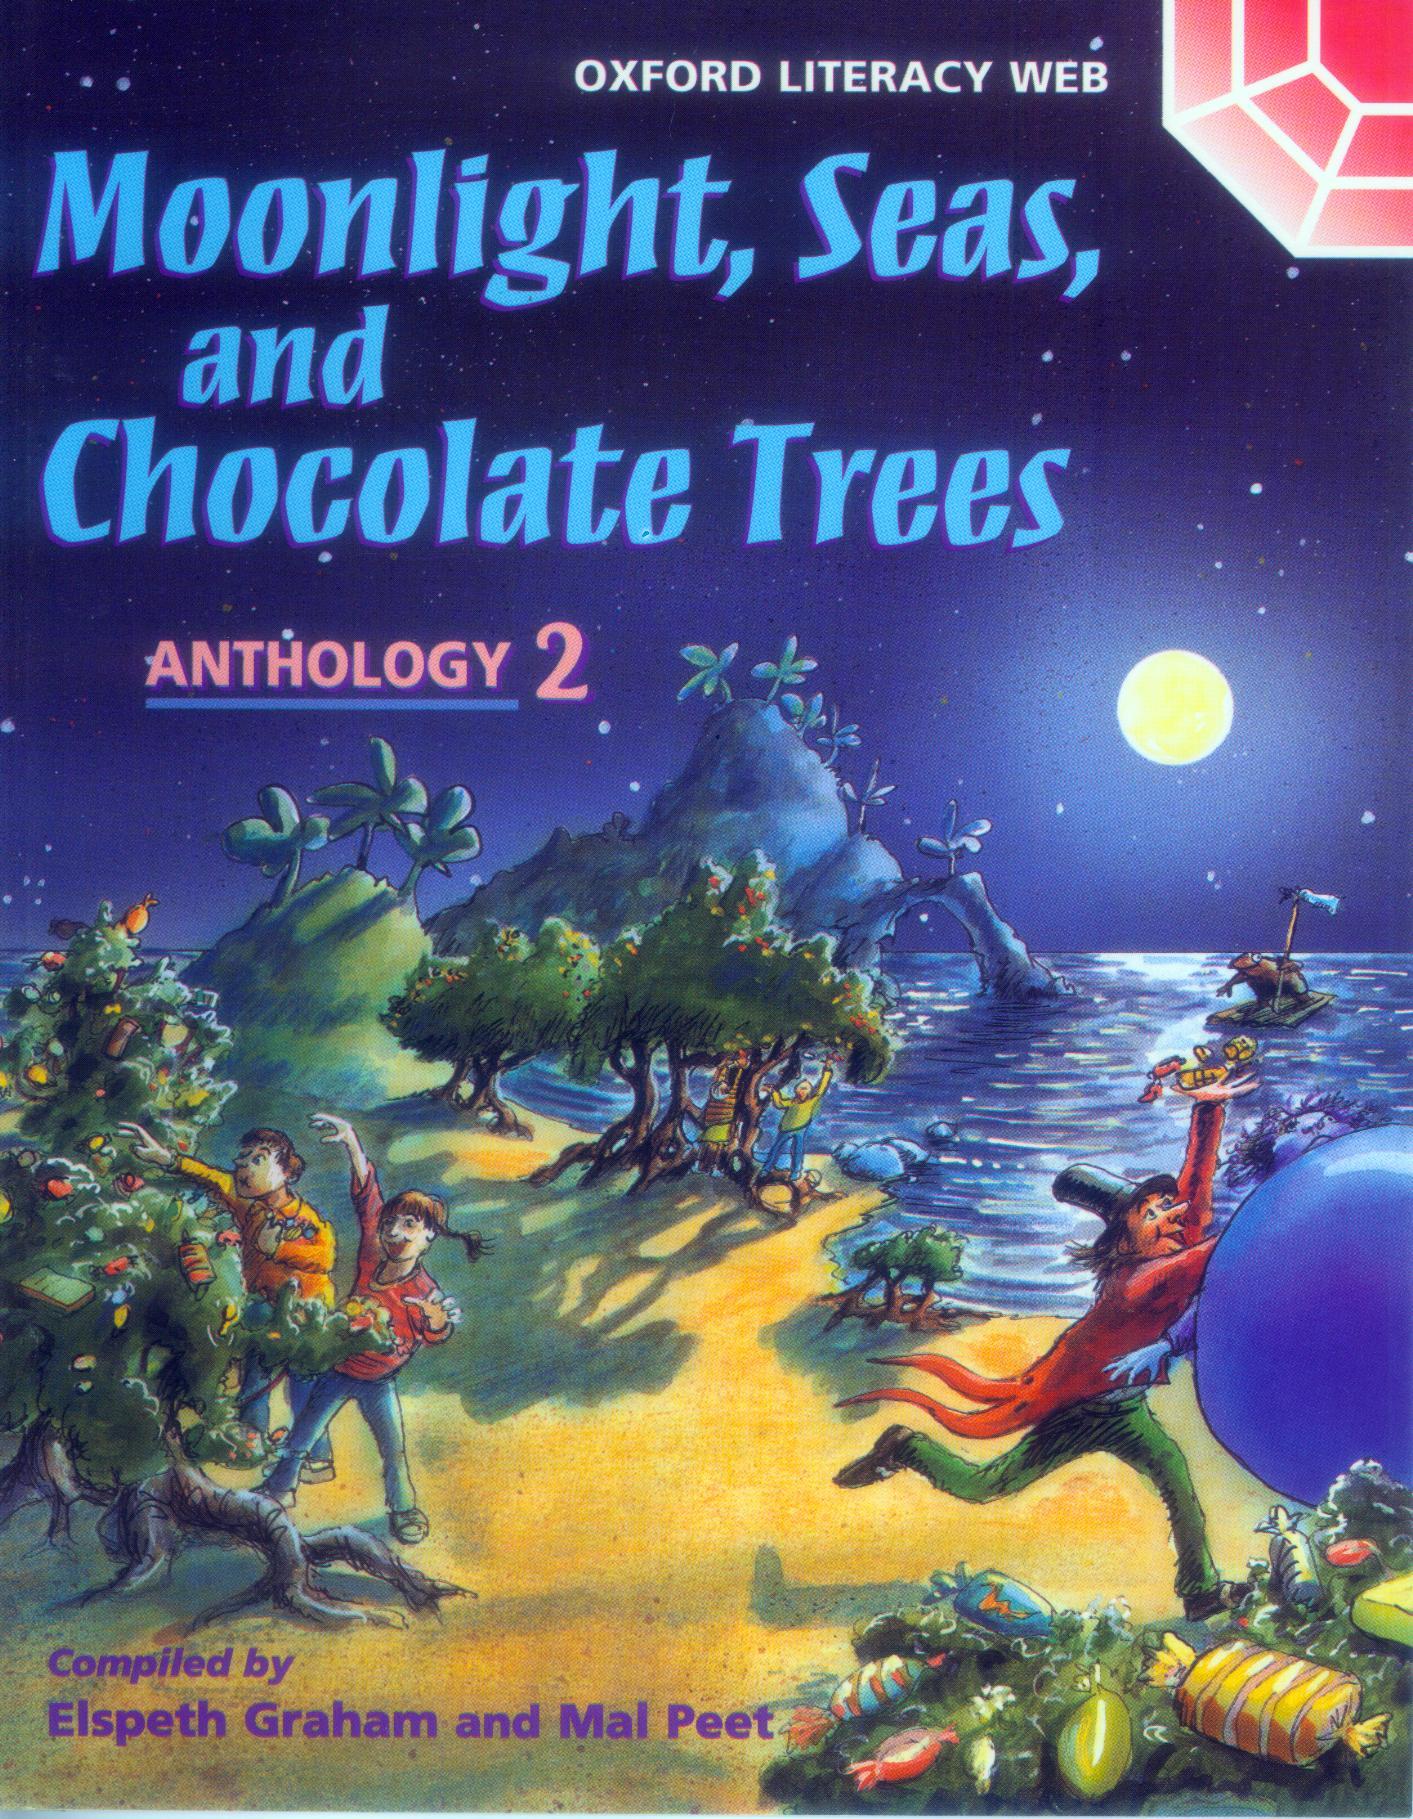 Moonlight, Seas, and...